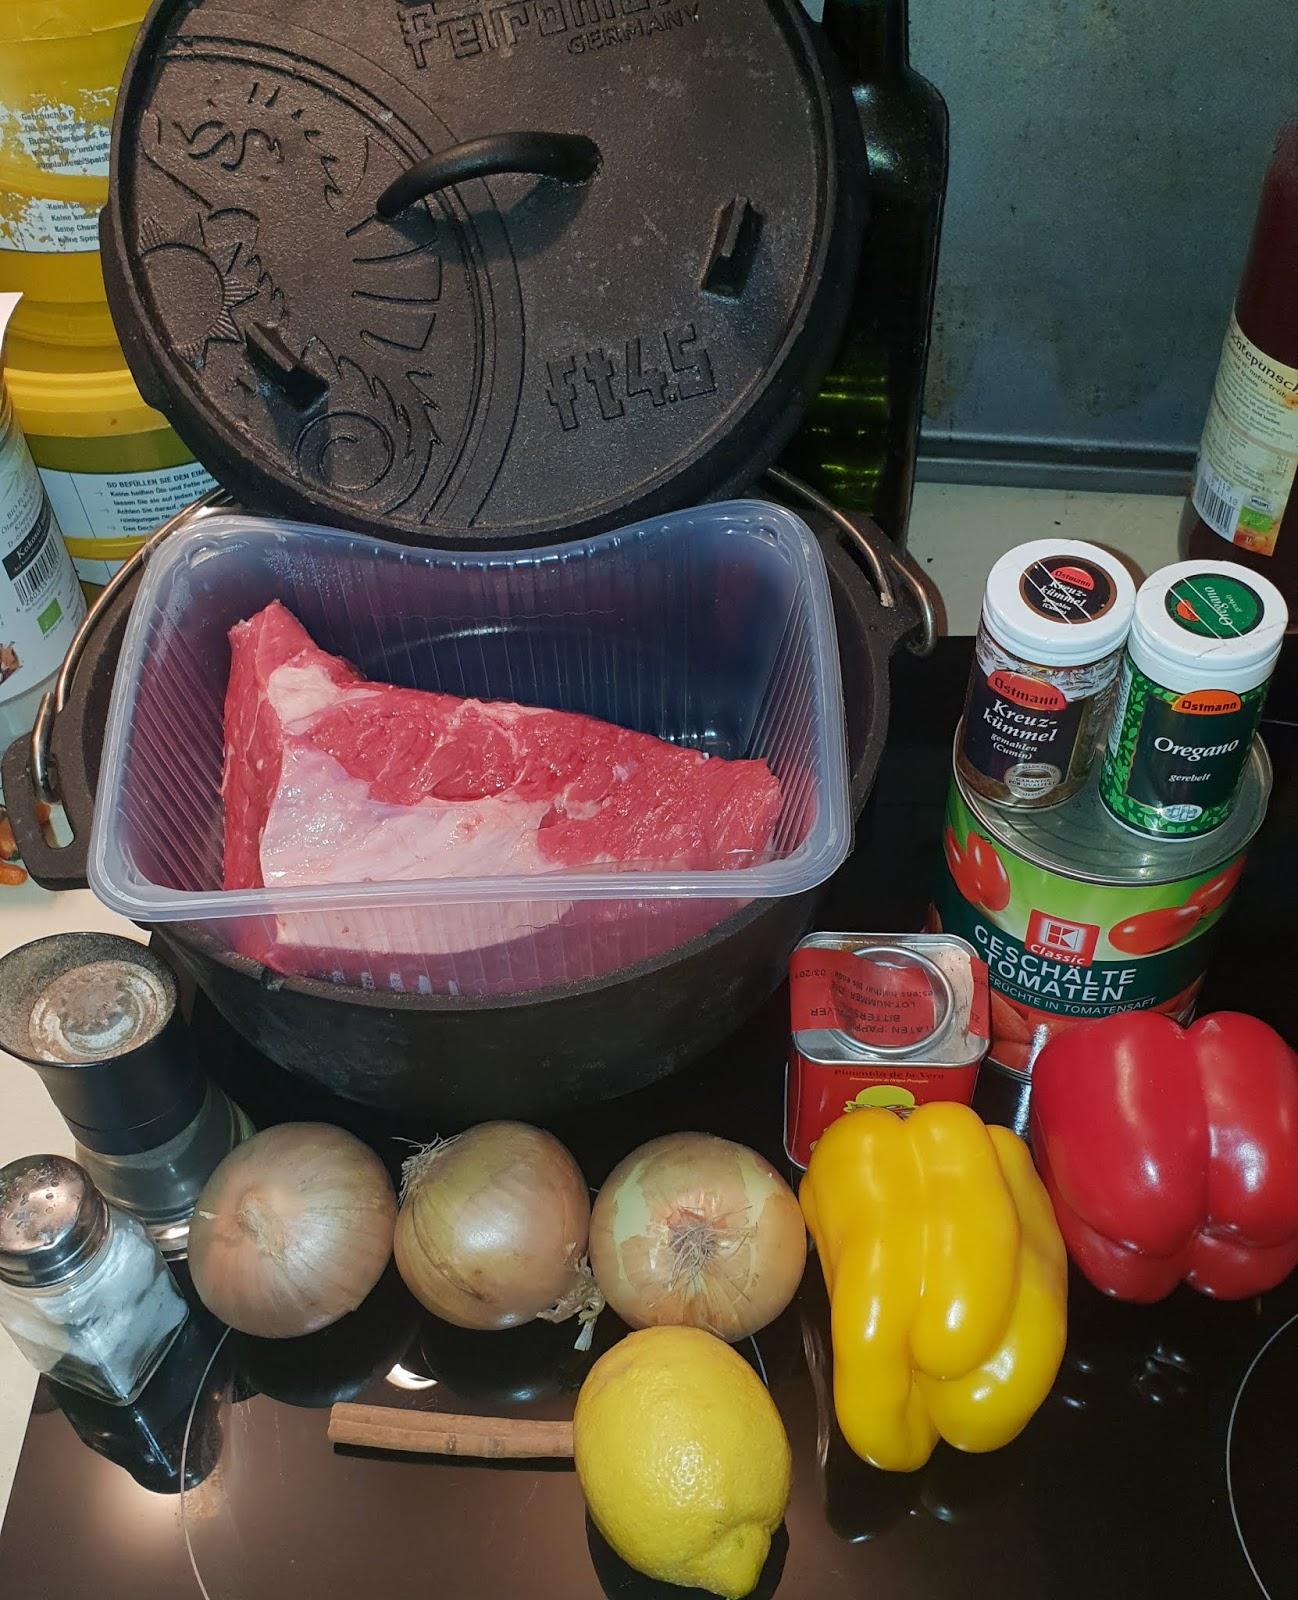 Chilihead77de Chili Con Carne Jamie Oliver Style Aus Dem Dutch Oven